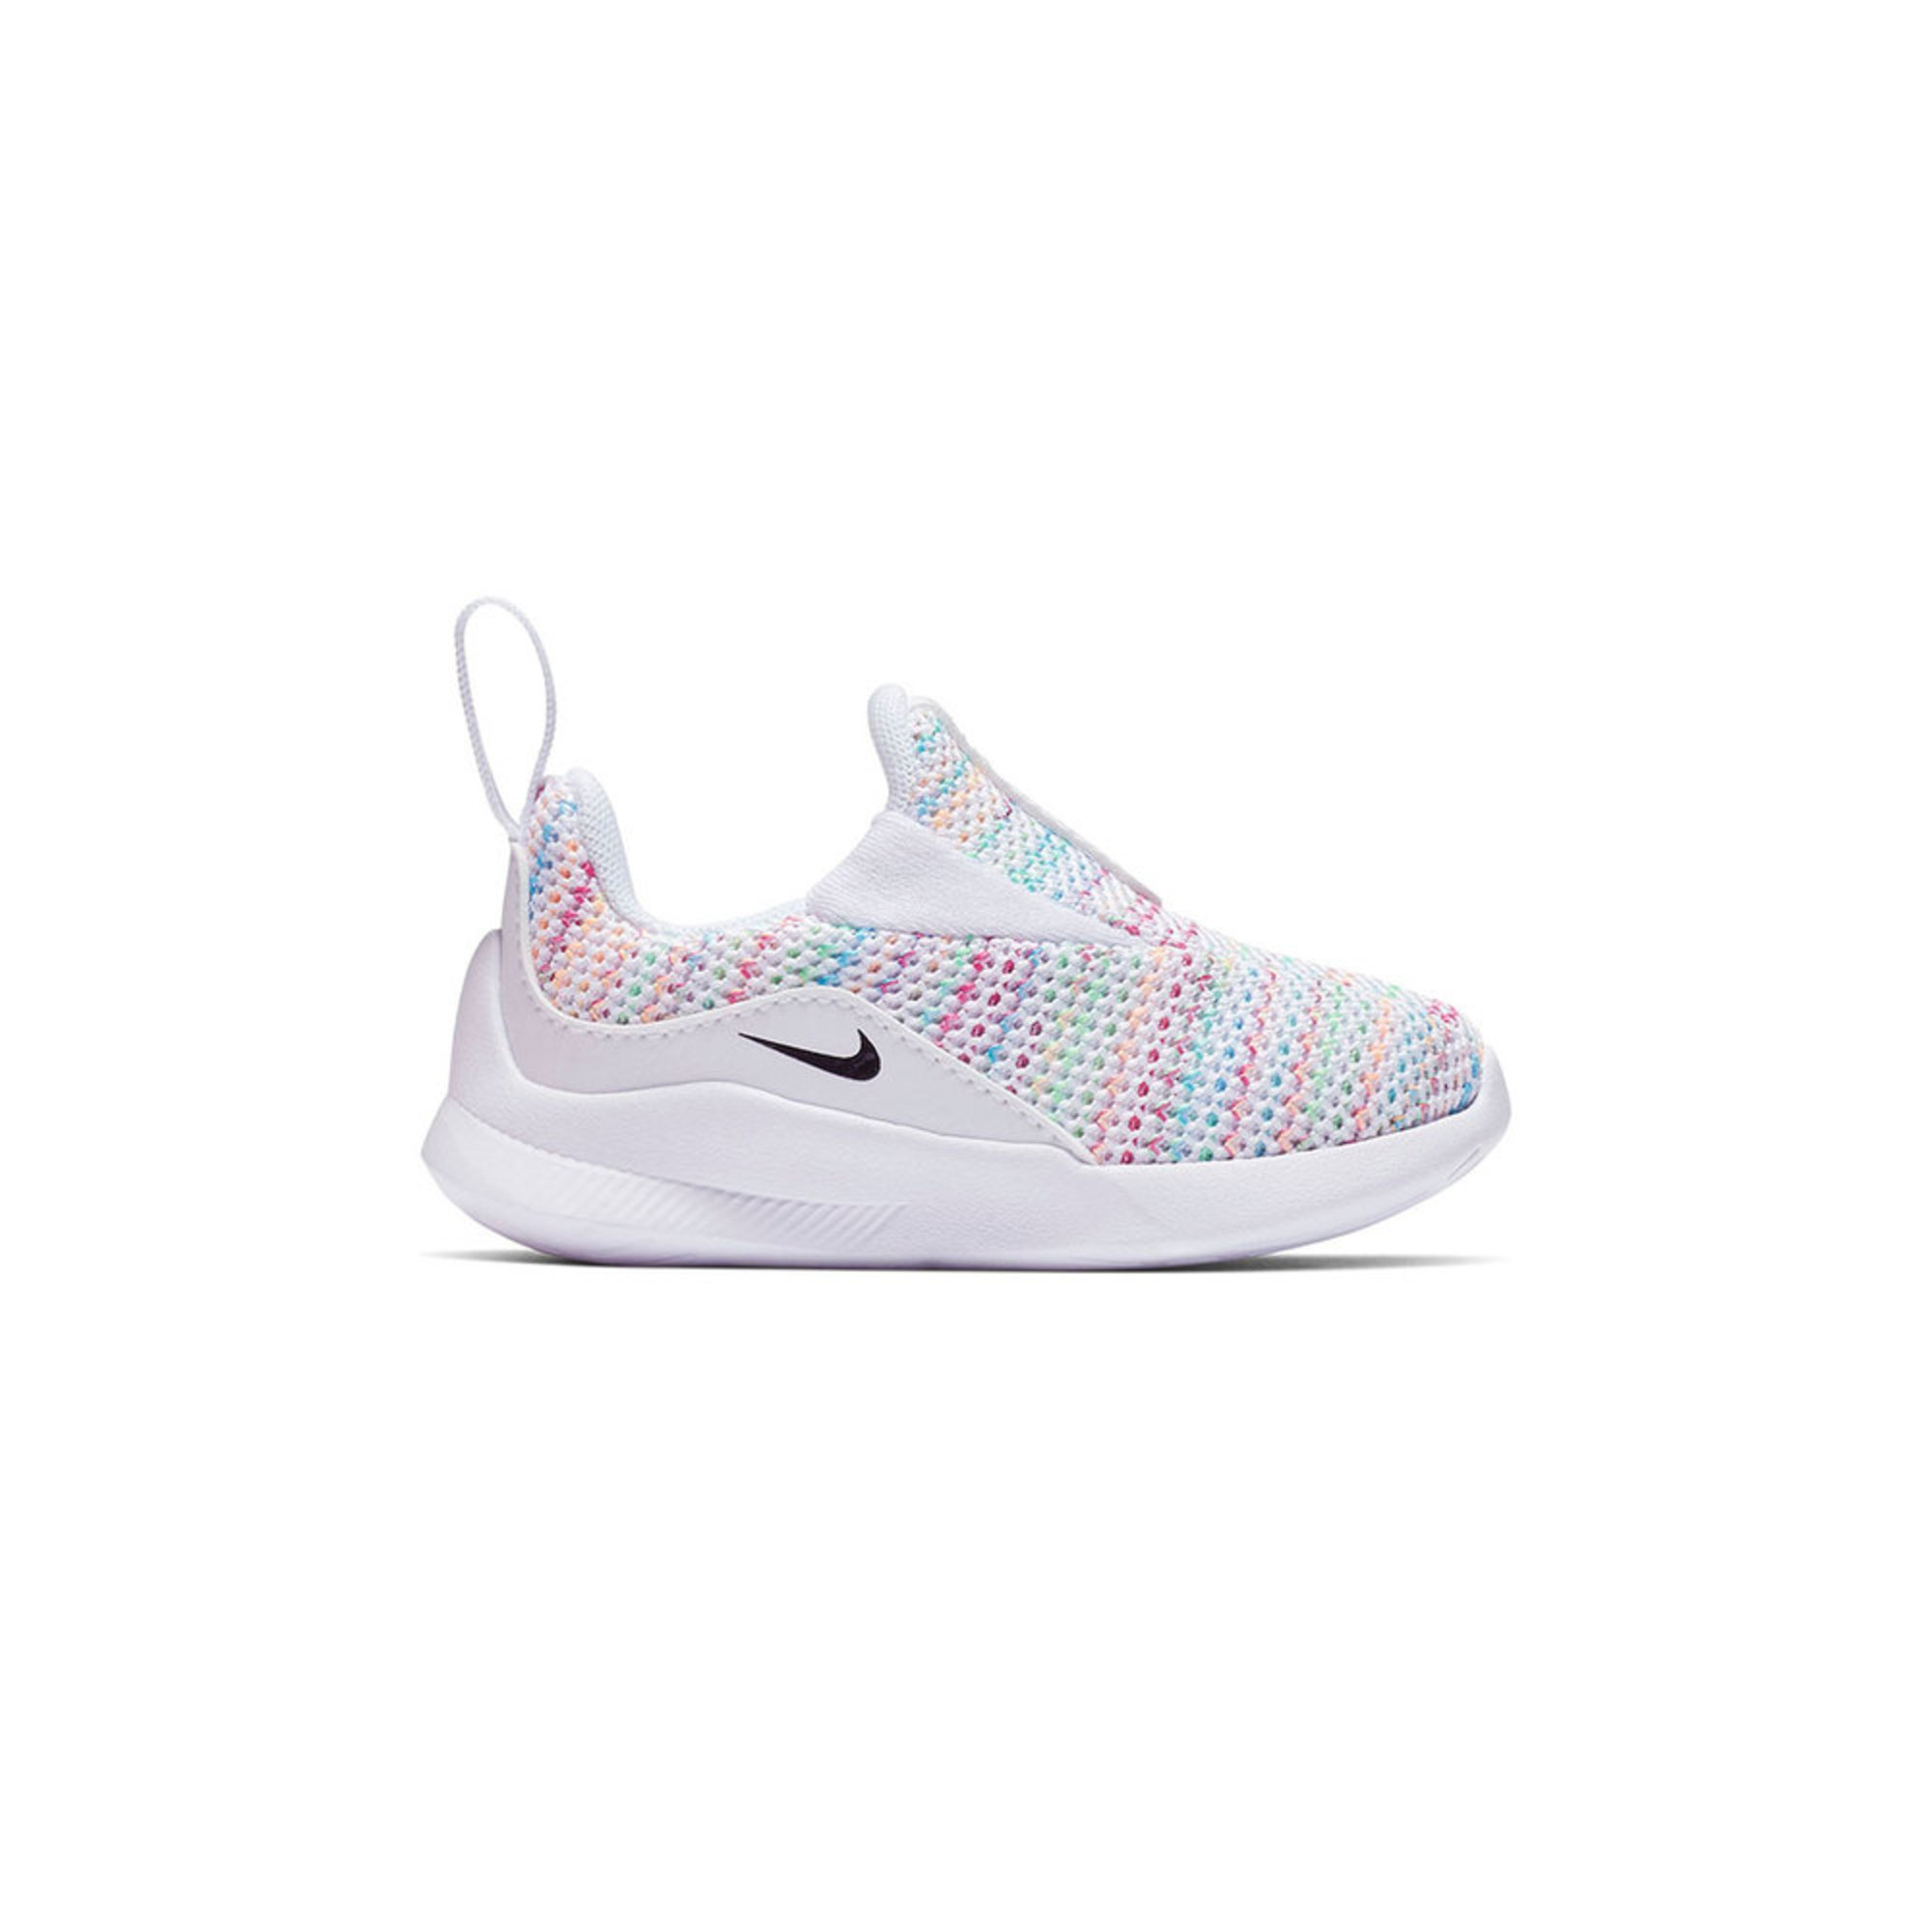 1b6407410a32 Nike Girls Viale Space Dye Running Shoe (infant toddler)